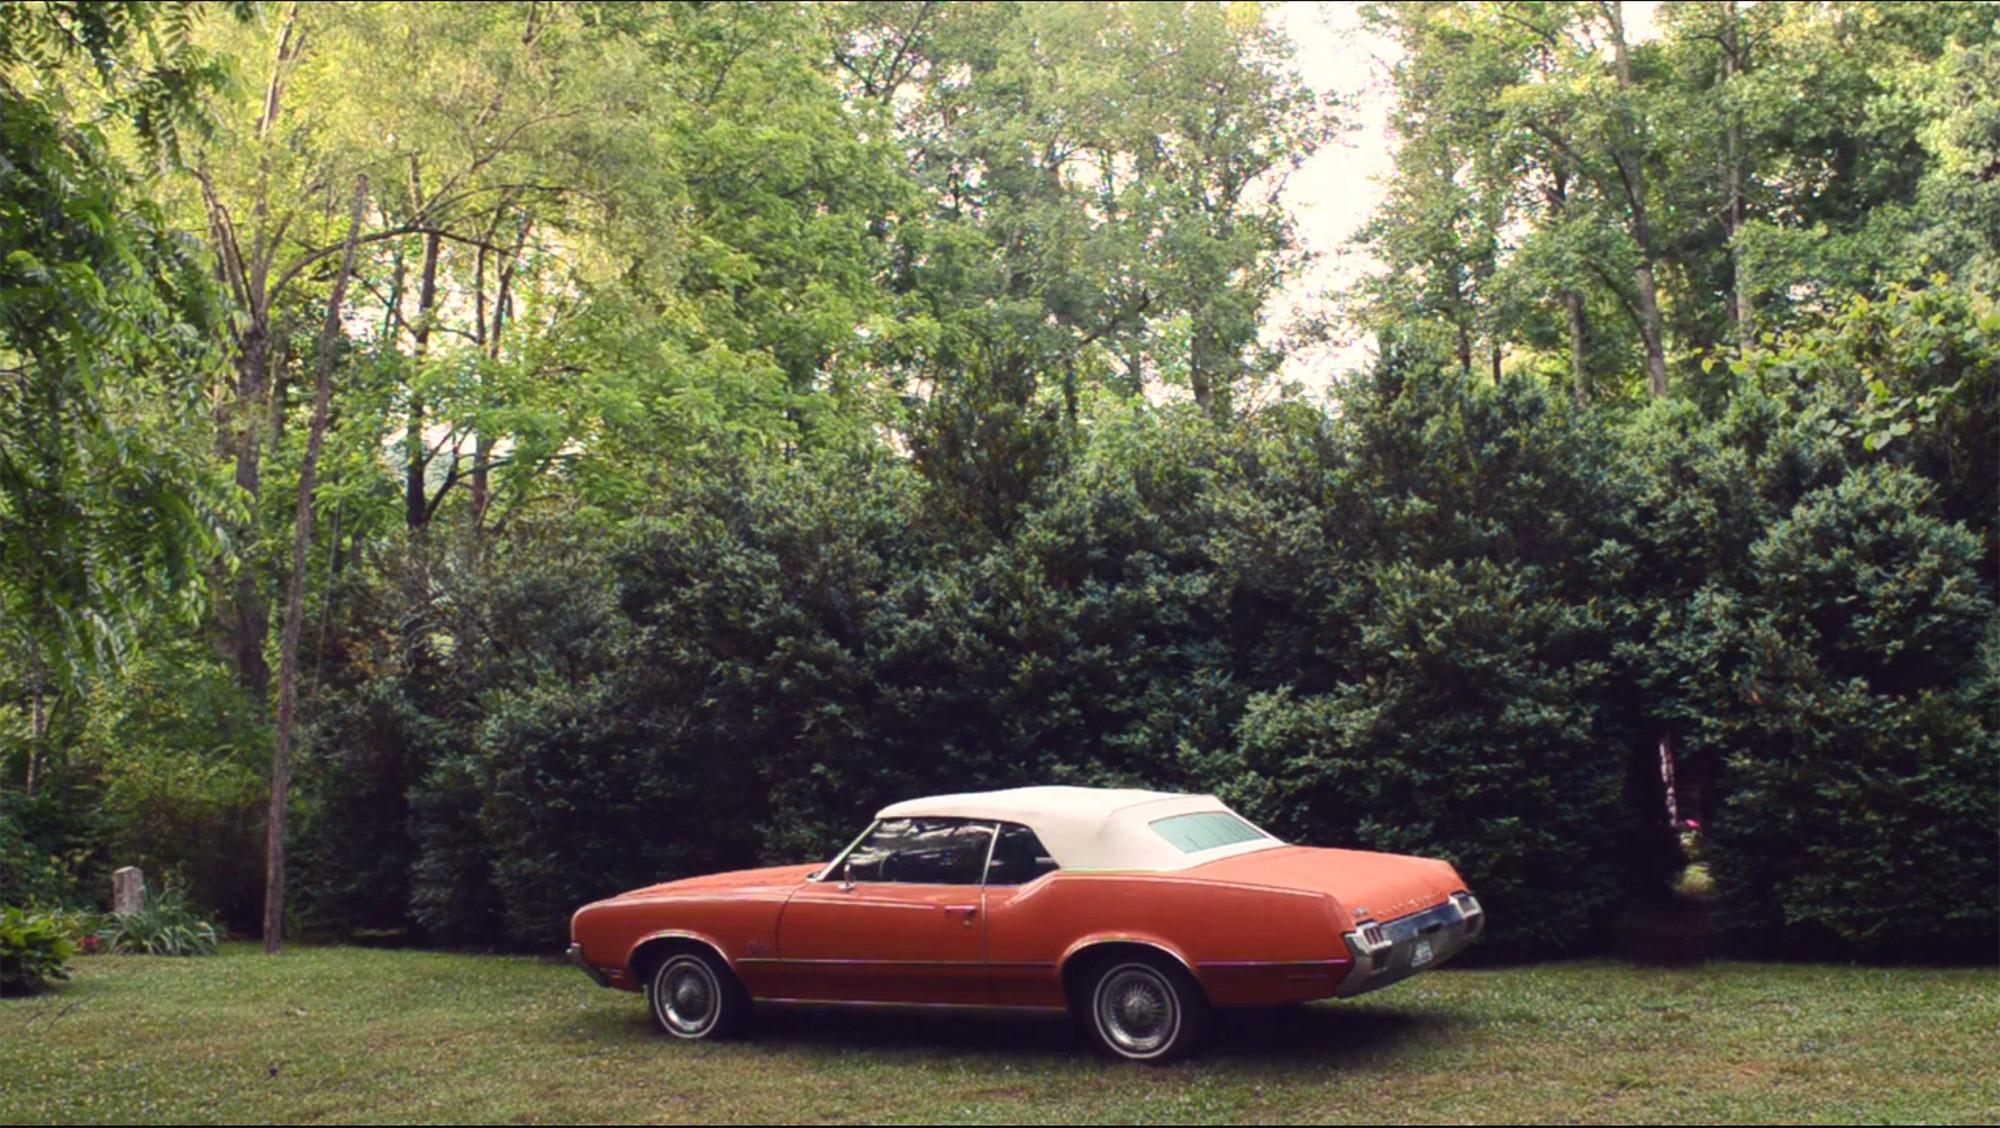 red-car-mary-lattimore-video.jpg